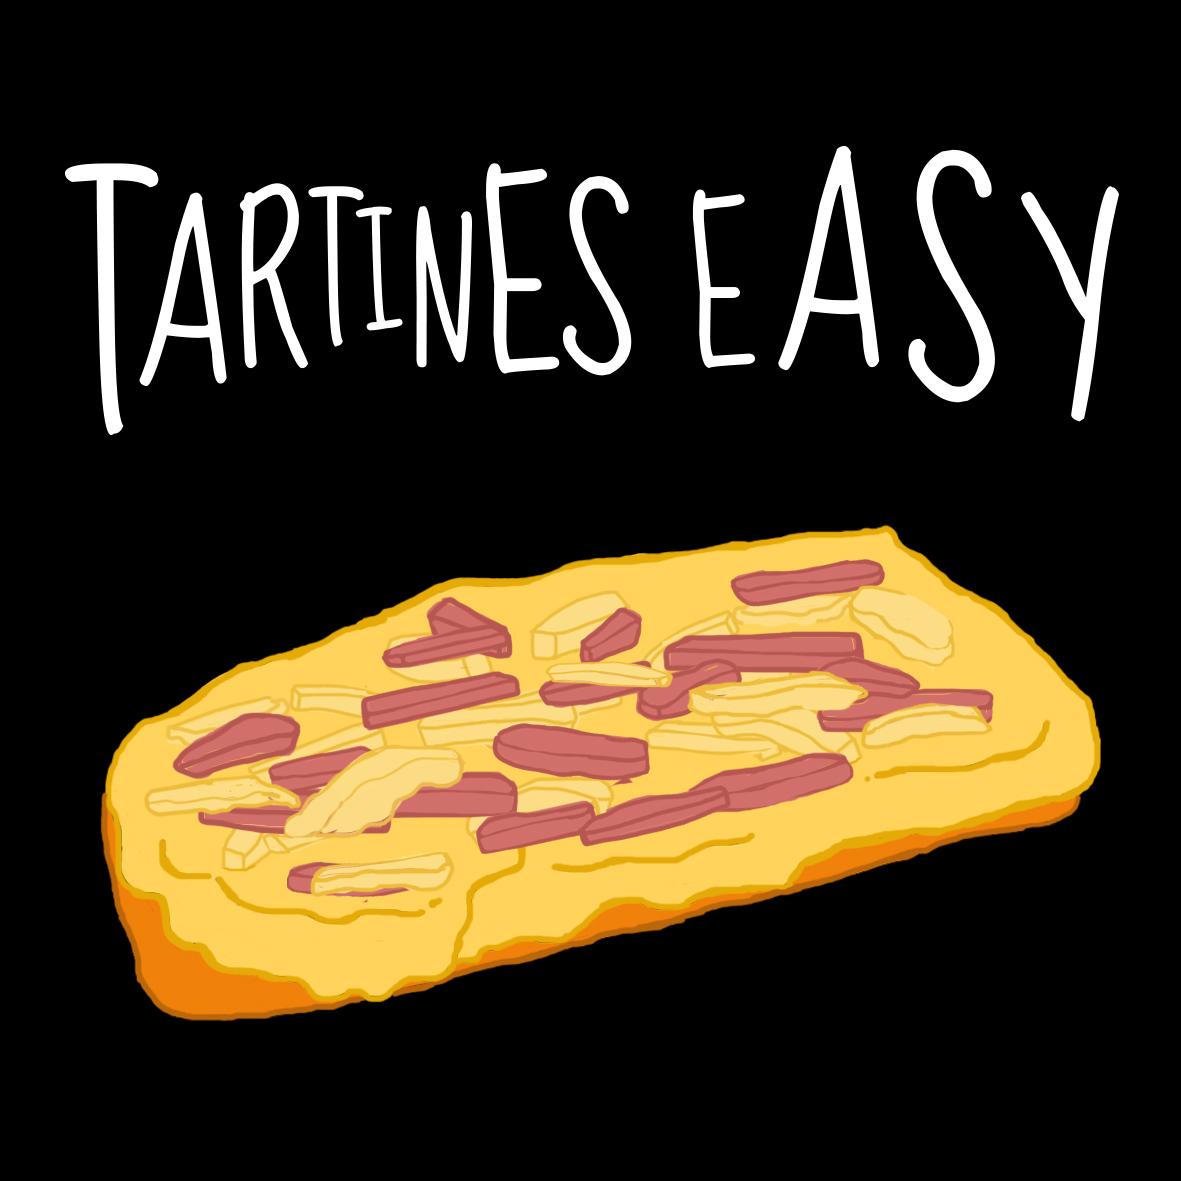 Tartines Easy